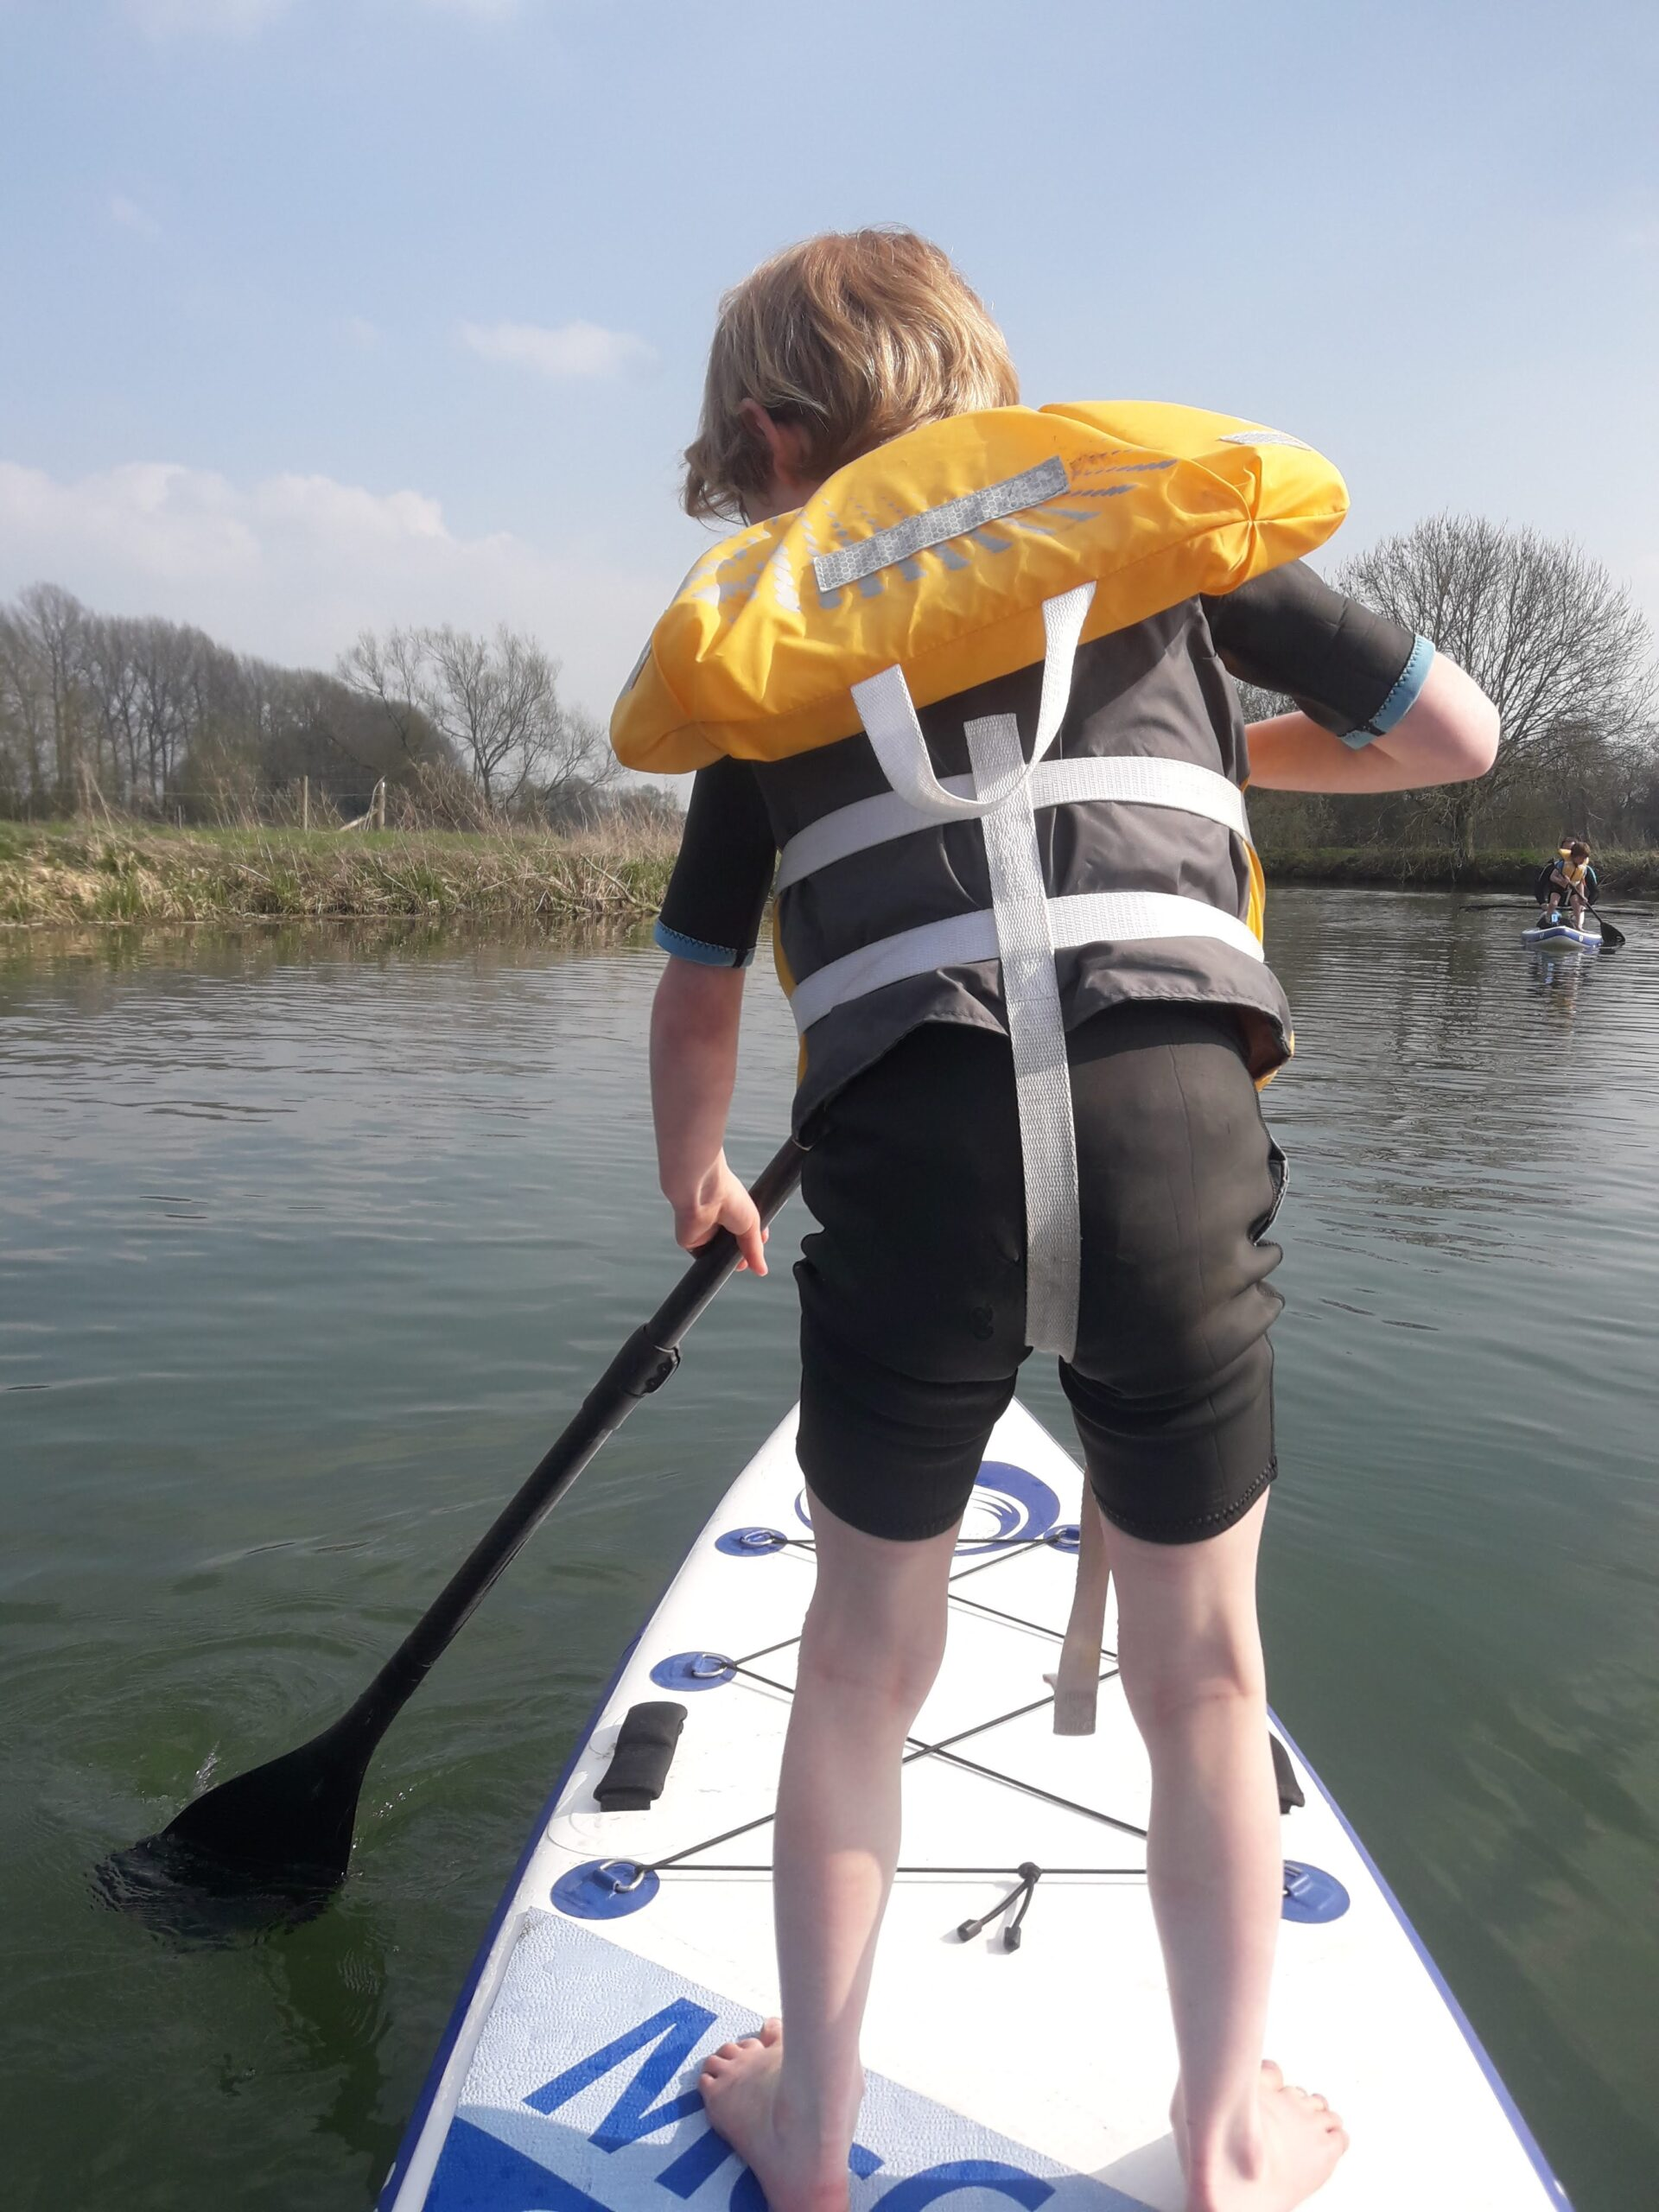 Do I need a kids inflatable paddleboard?